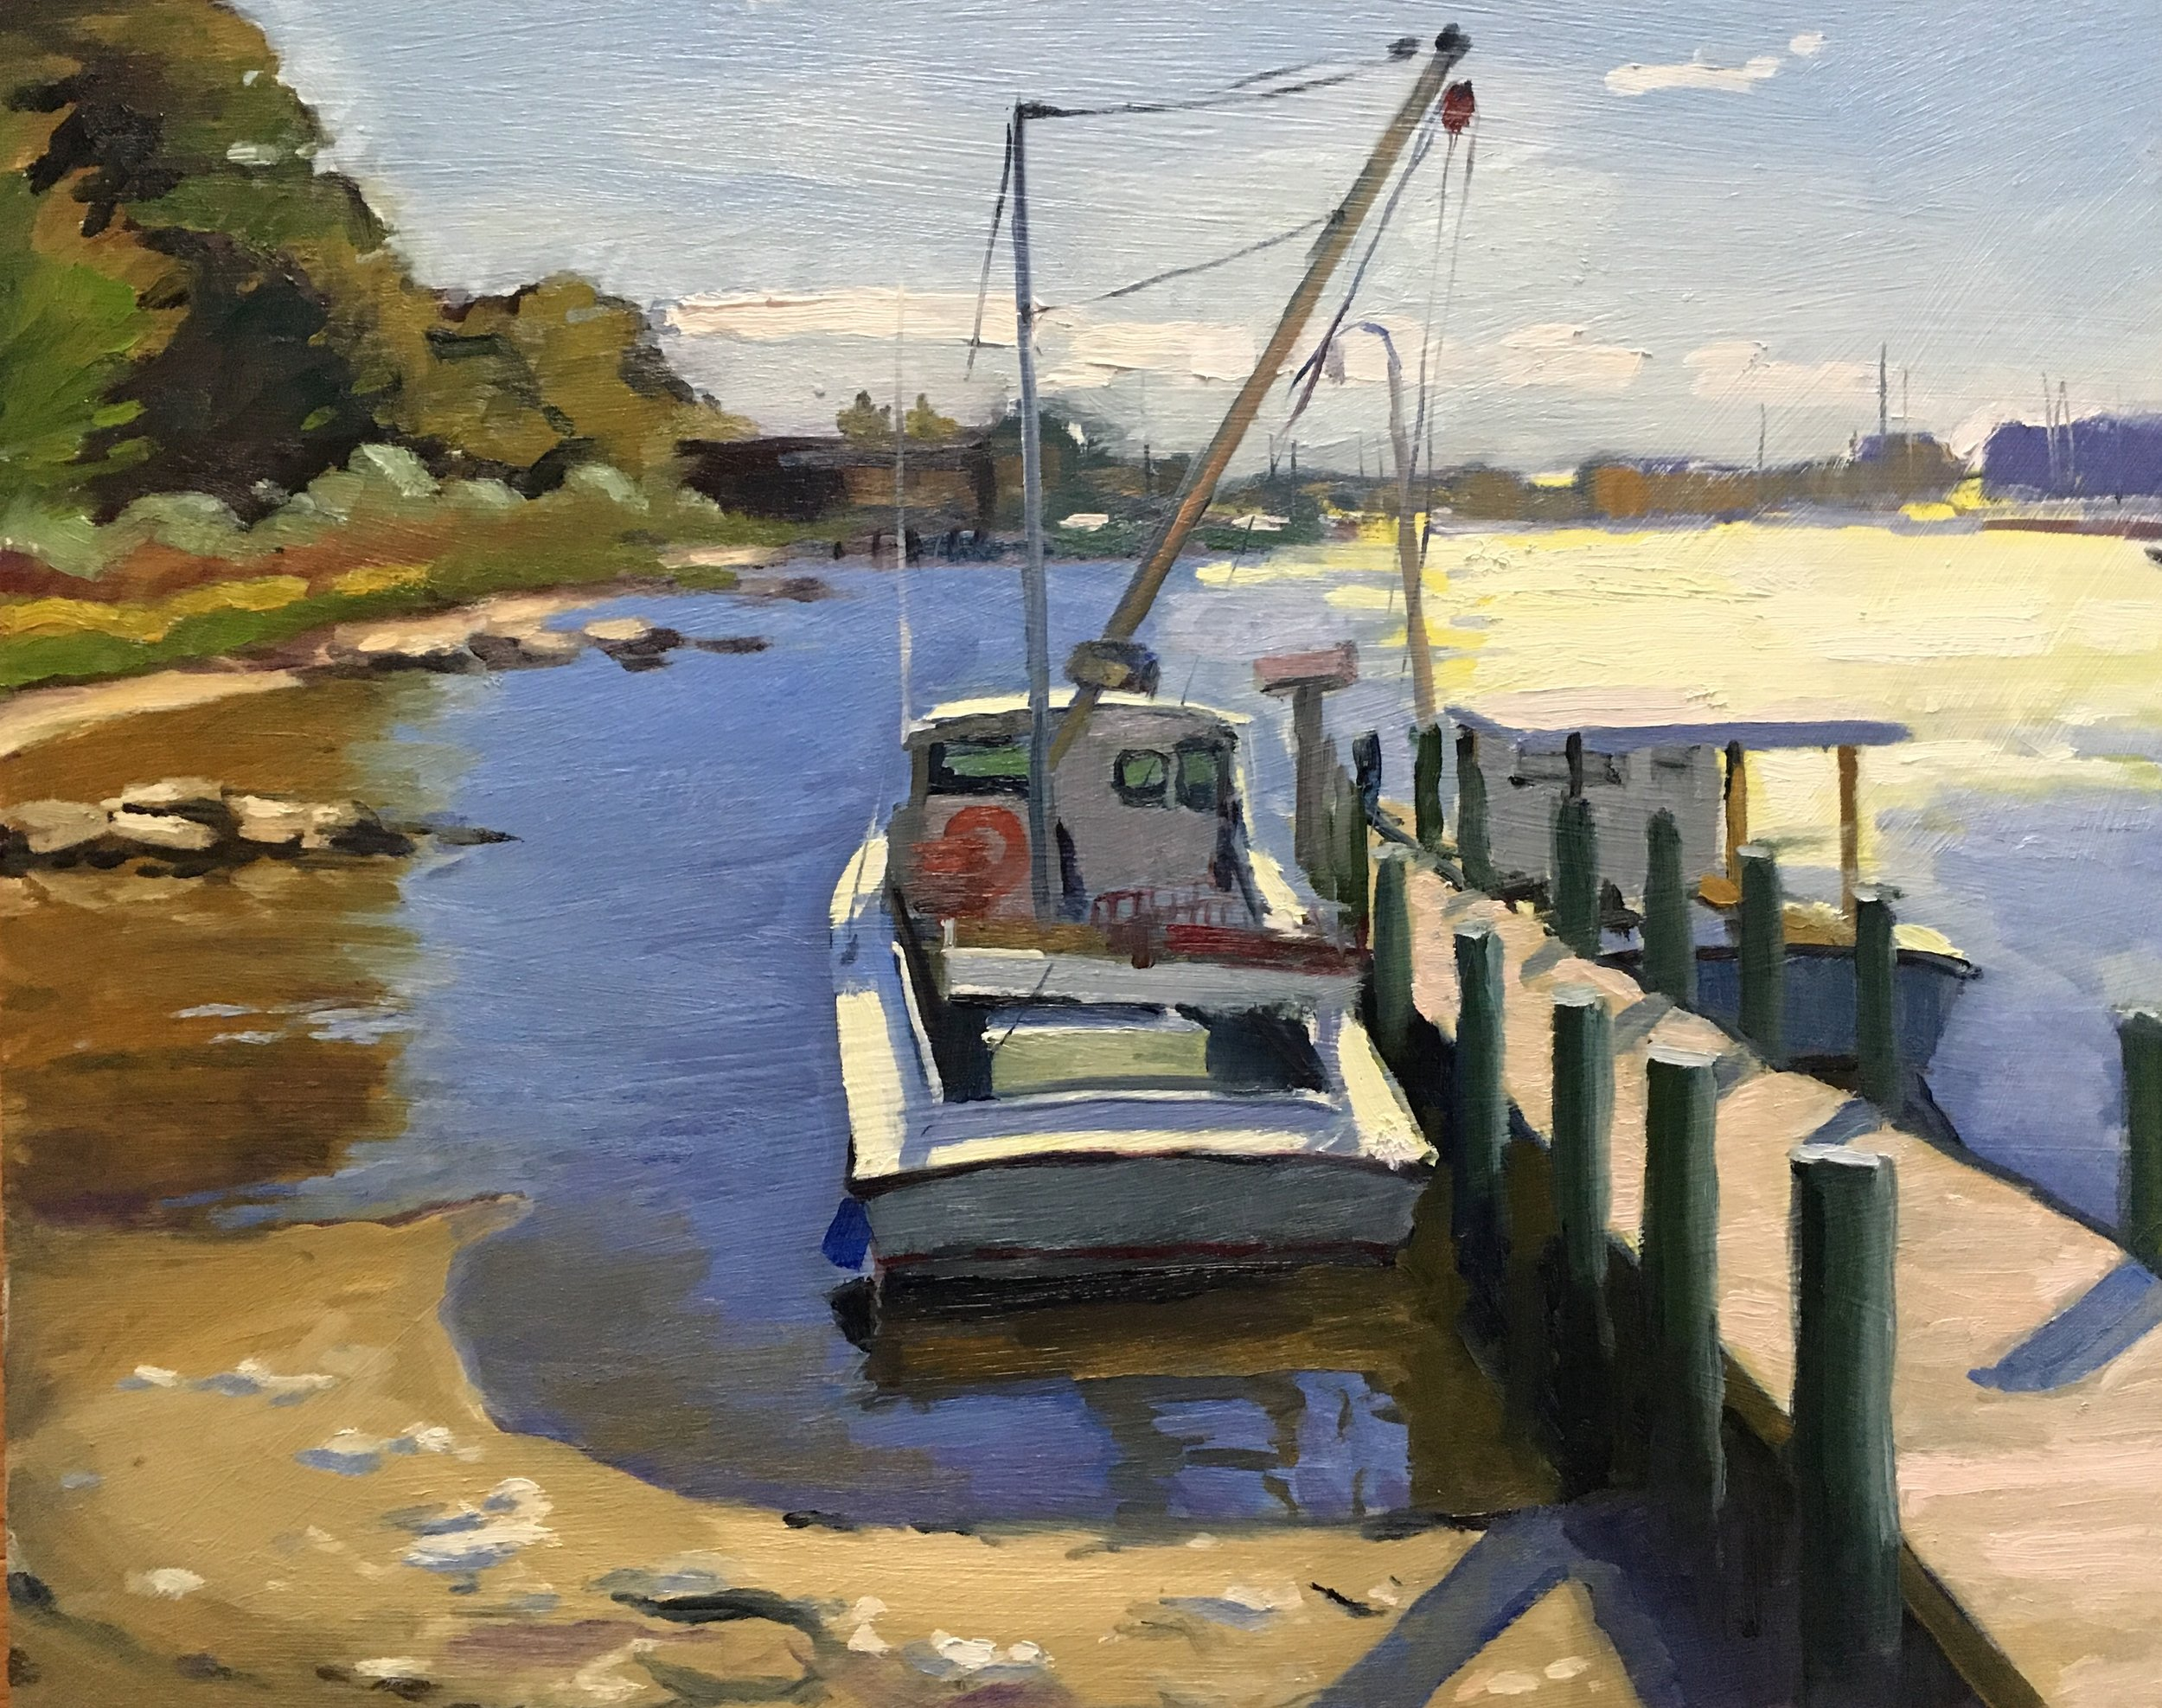 Solomons Workboats